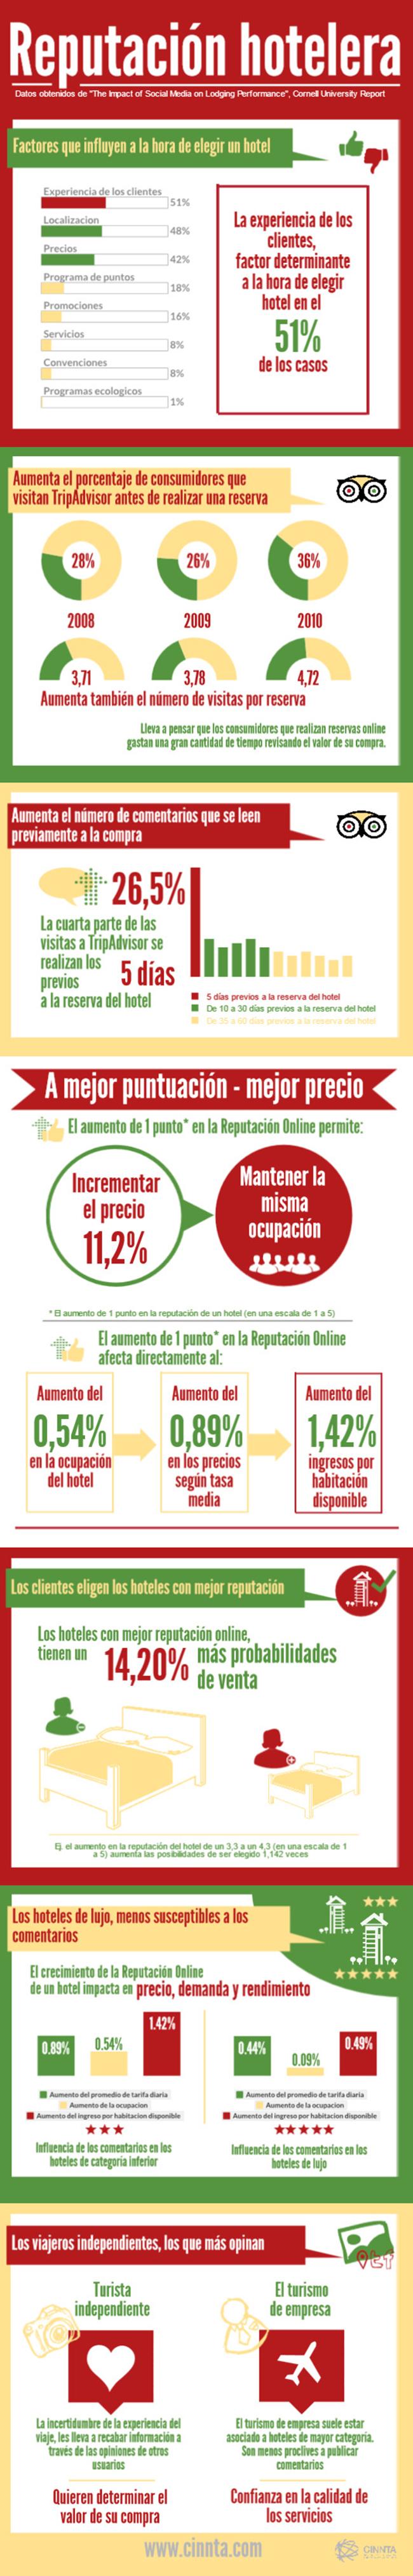 infografia-reputacion-hotelera-cinnta